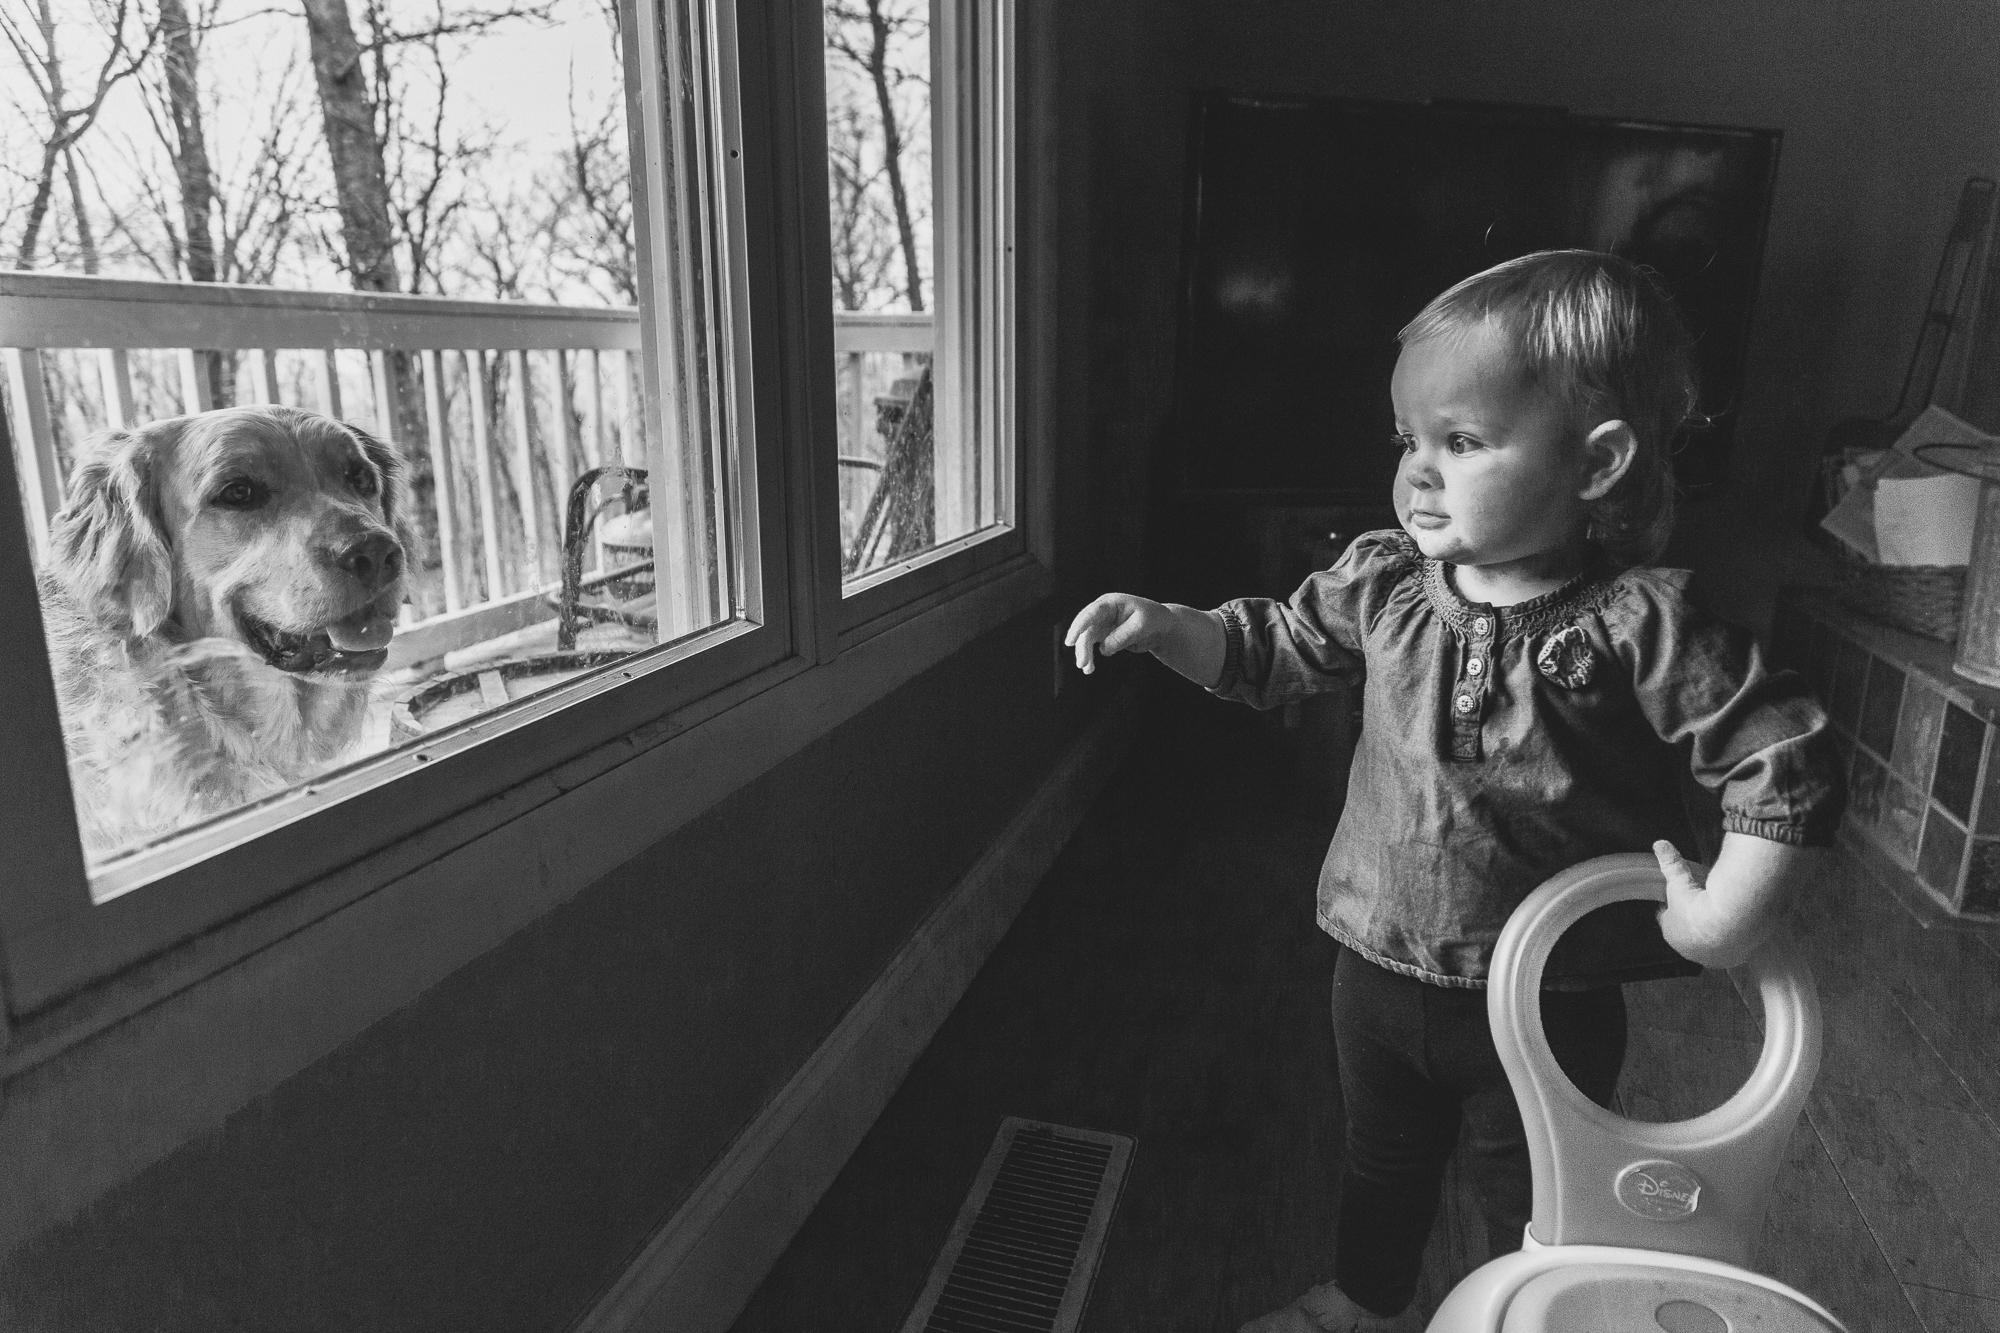 Wes_Ryan_Photography-emma-abby_156.jpg